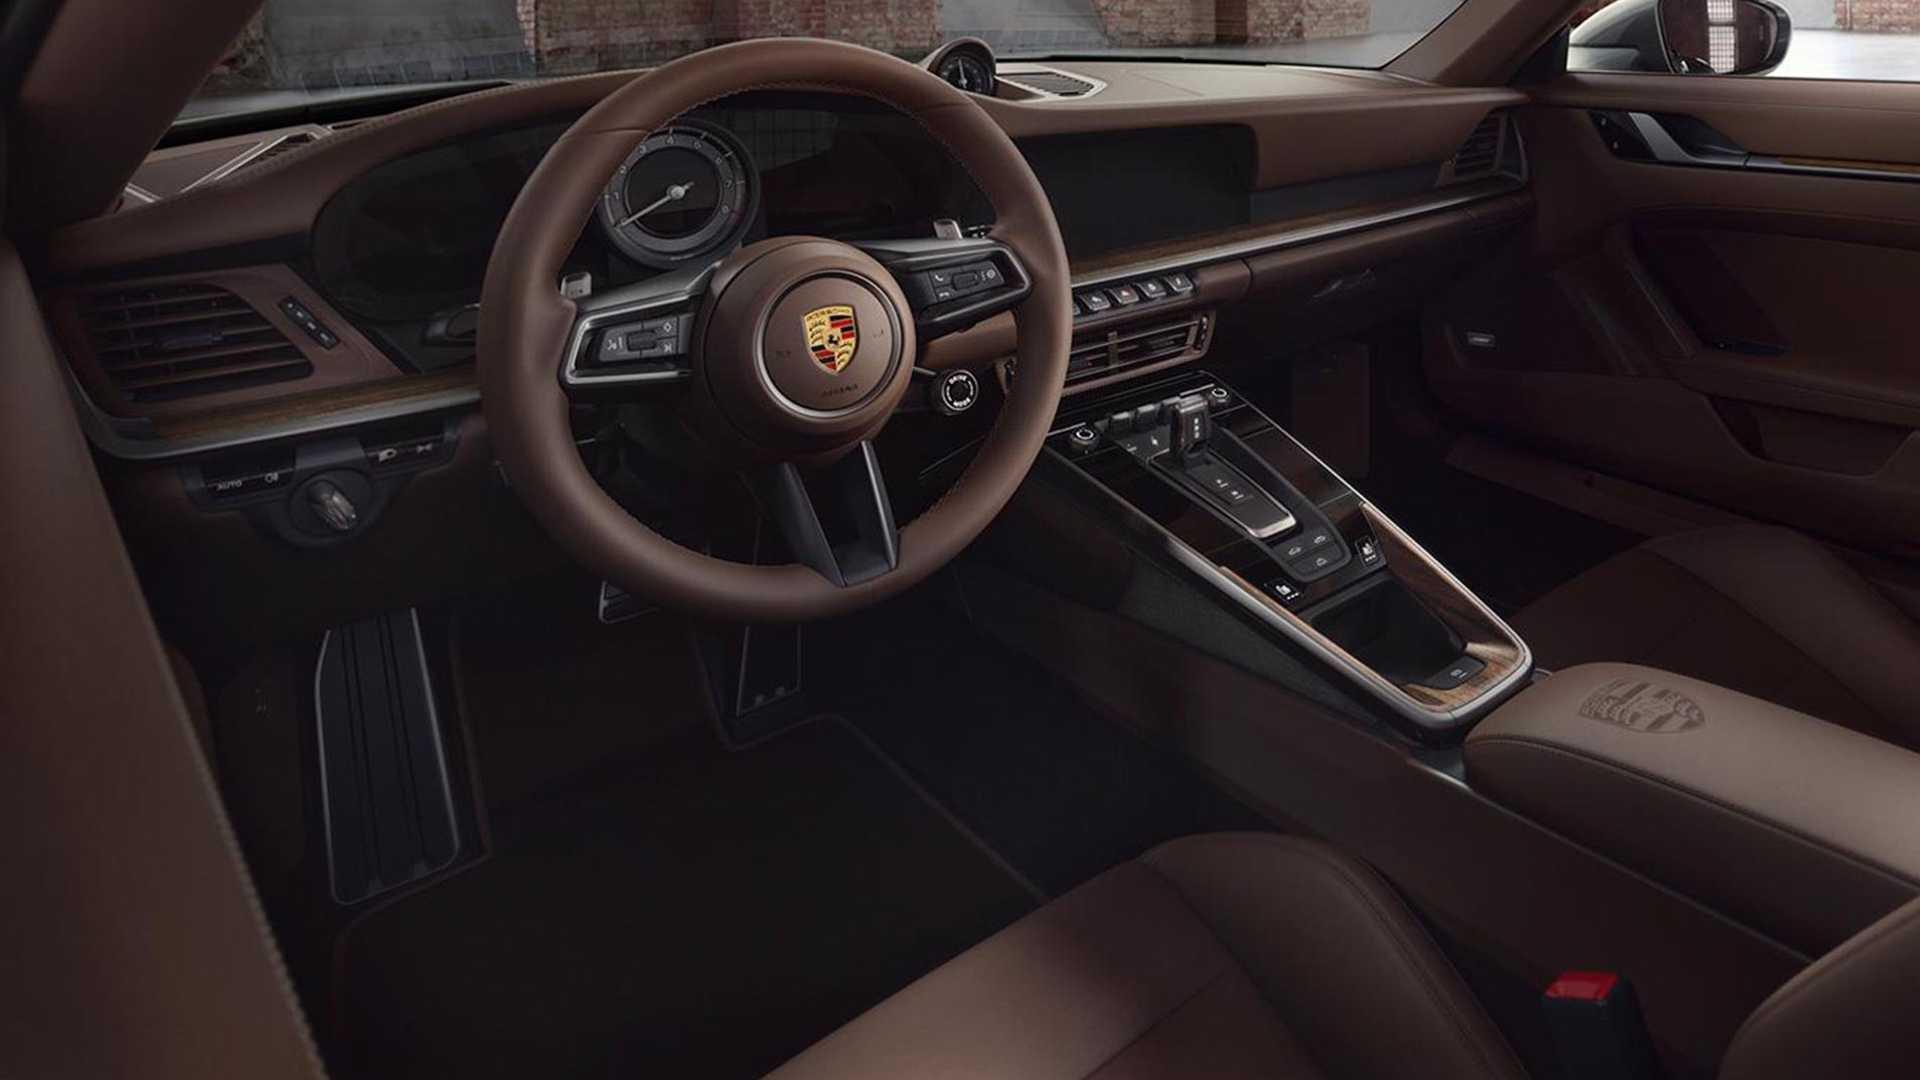 2020 Porsche 911 Cabriolet Looks Slick With Exclusive Manufaktur Options